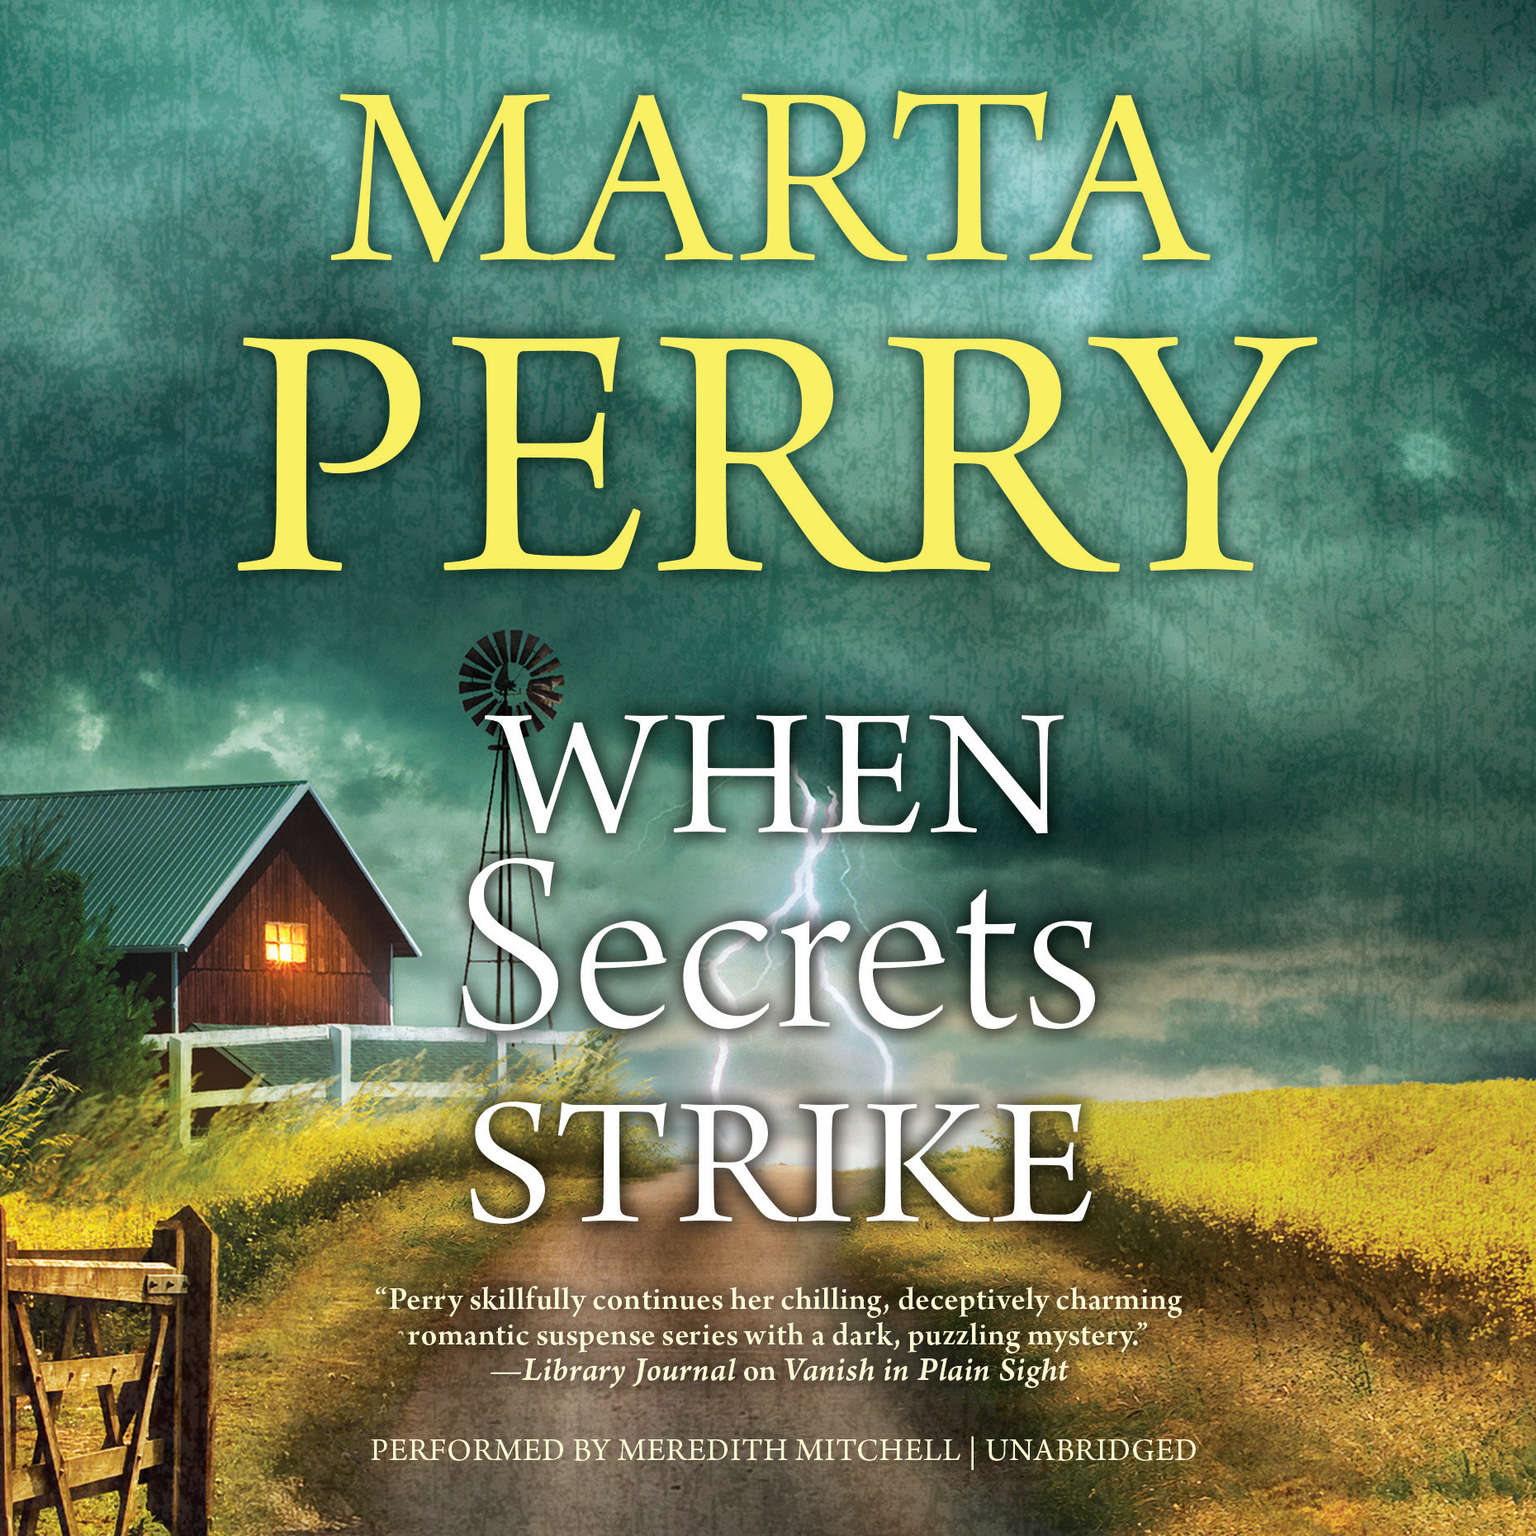 When Secrets Strike Audiobook, by Marta Perry